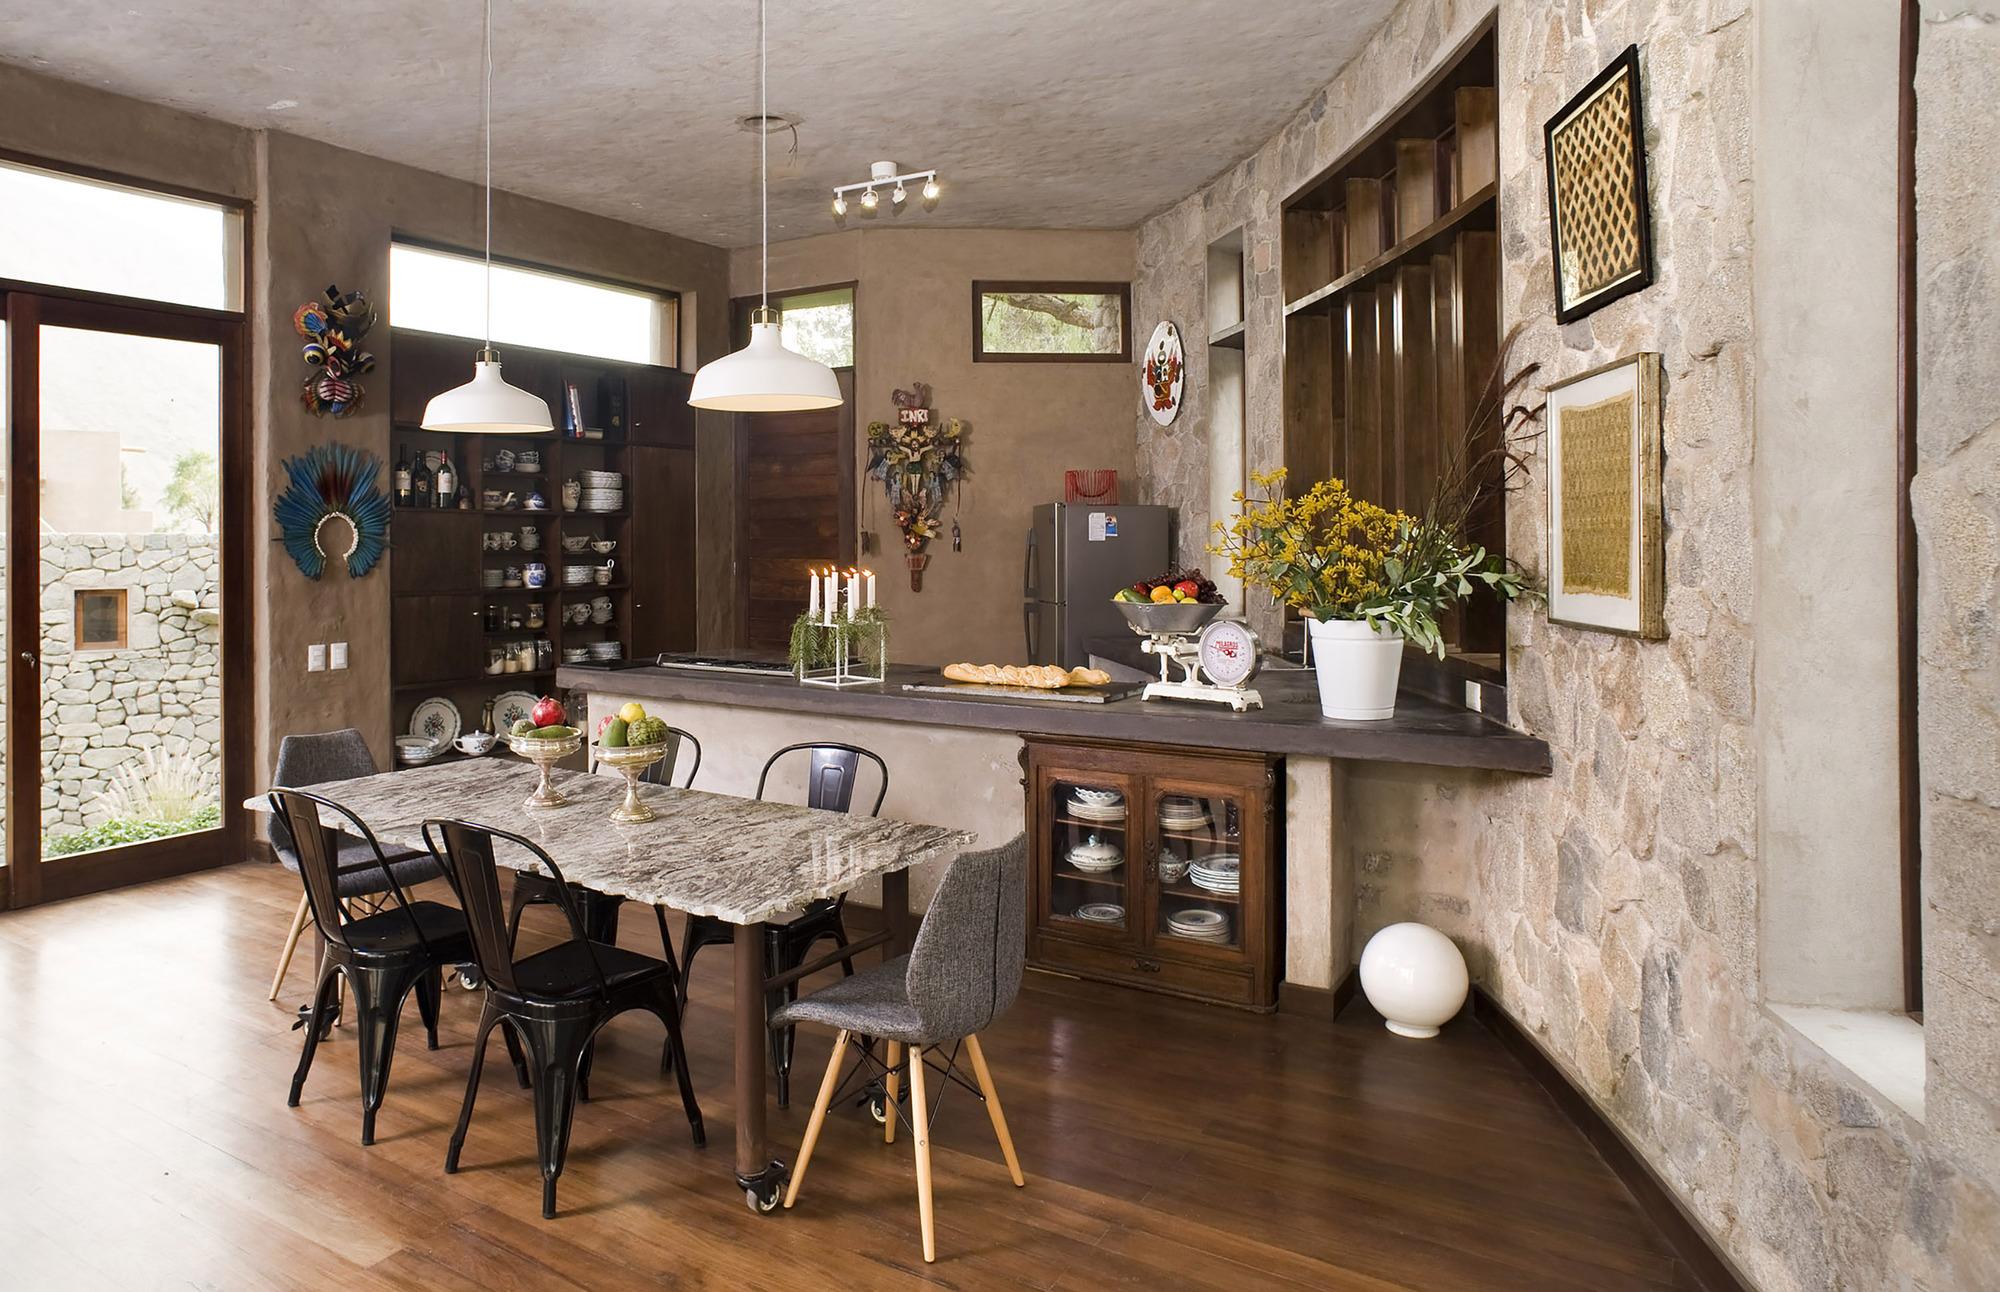 Galeria de casa chontay marina vella arquitectos 11 for Casas modernas acogedoras